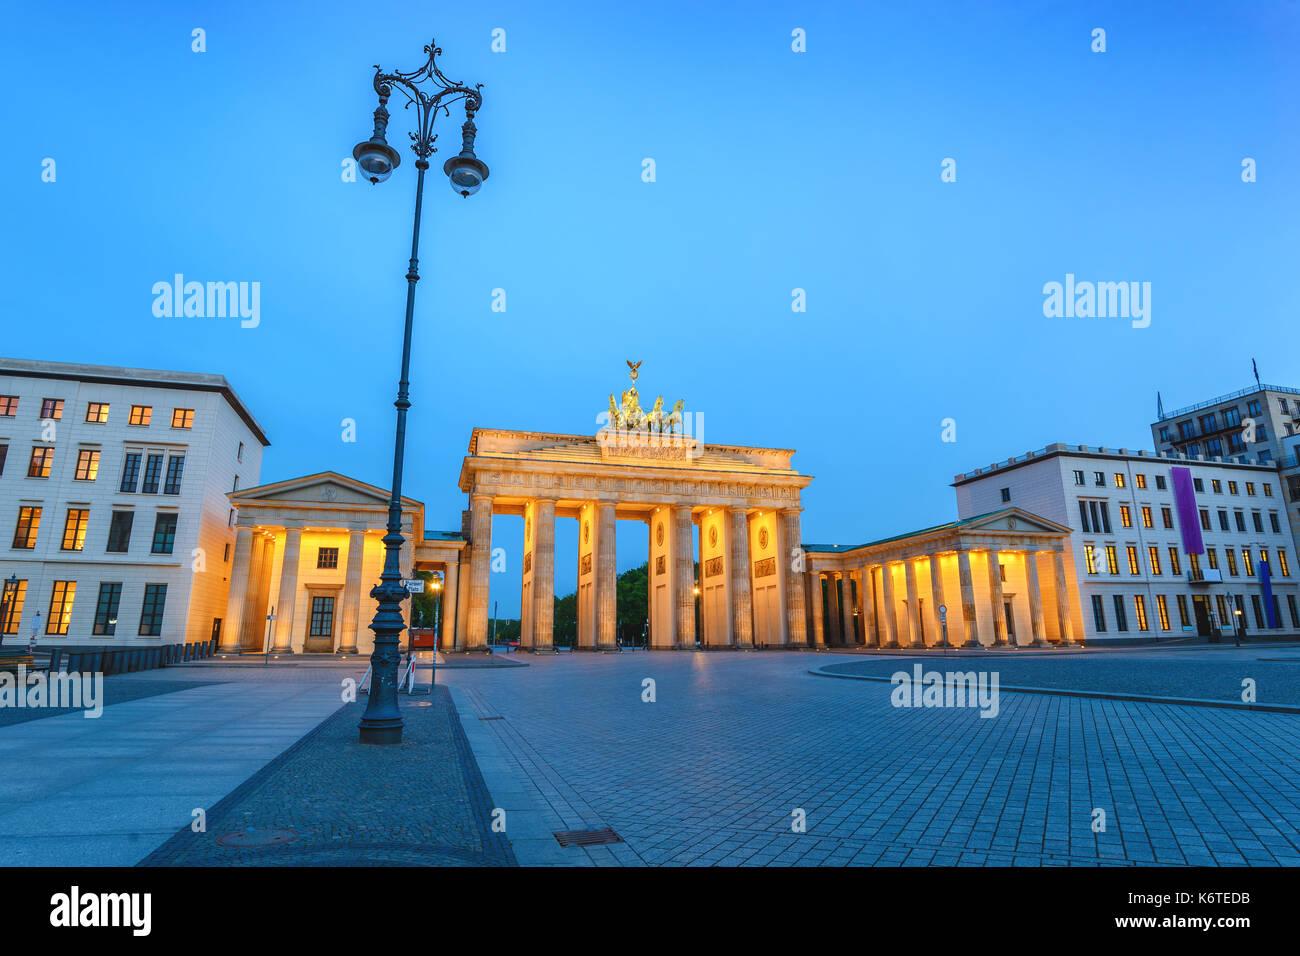 Berlin night city skyline at Brandenburg Gate (Brandenburger Tor), Berlin, Germany - Stock Image